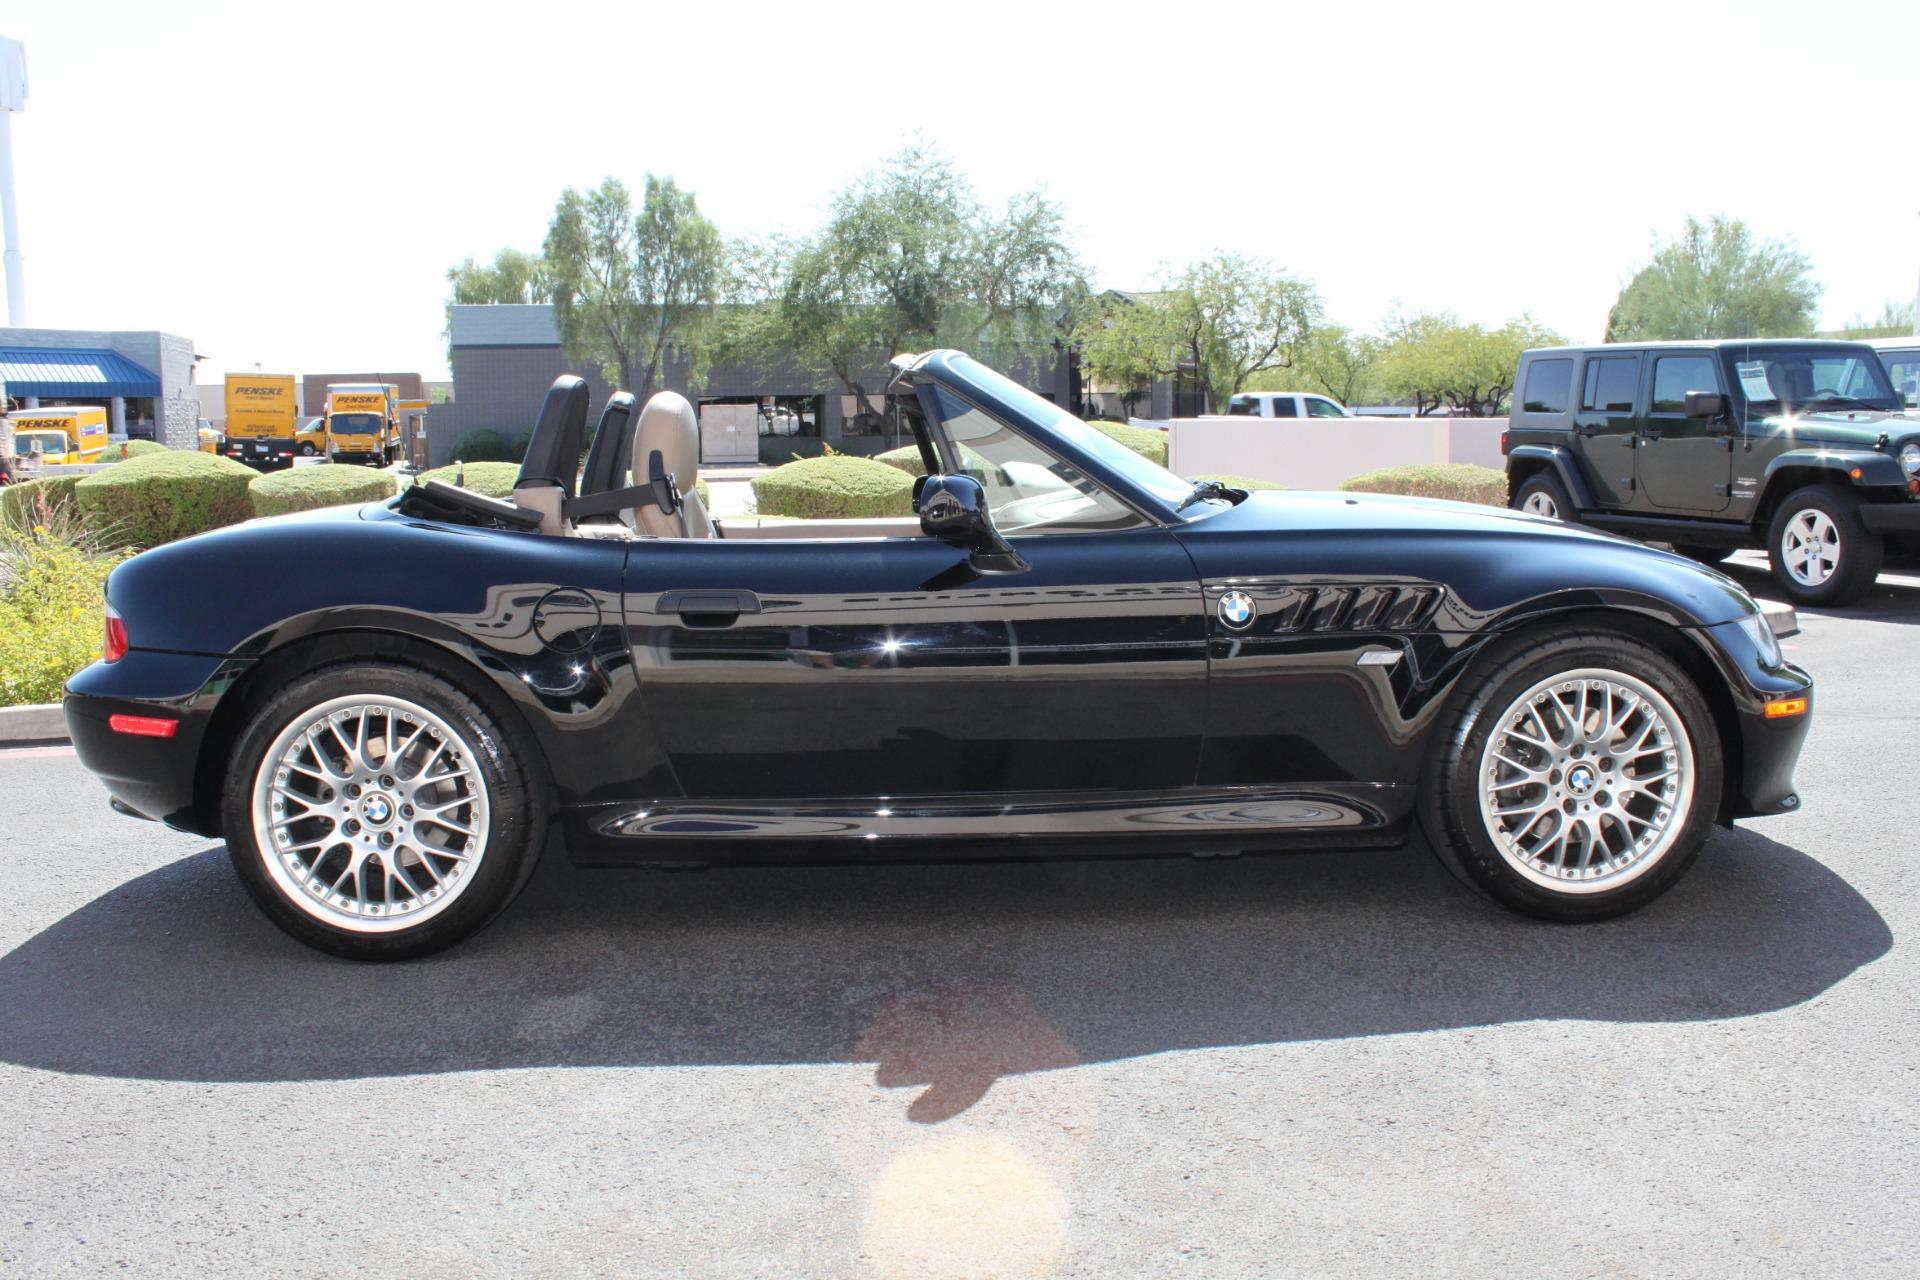 Used-2001-BMW-Z3-30i-Roadster-Chrysler